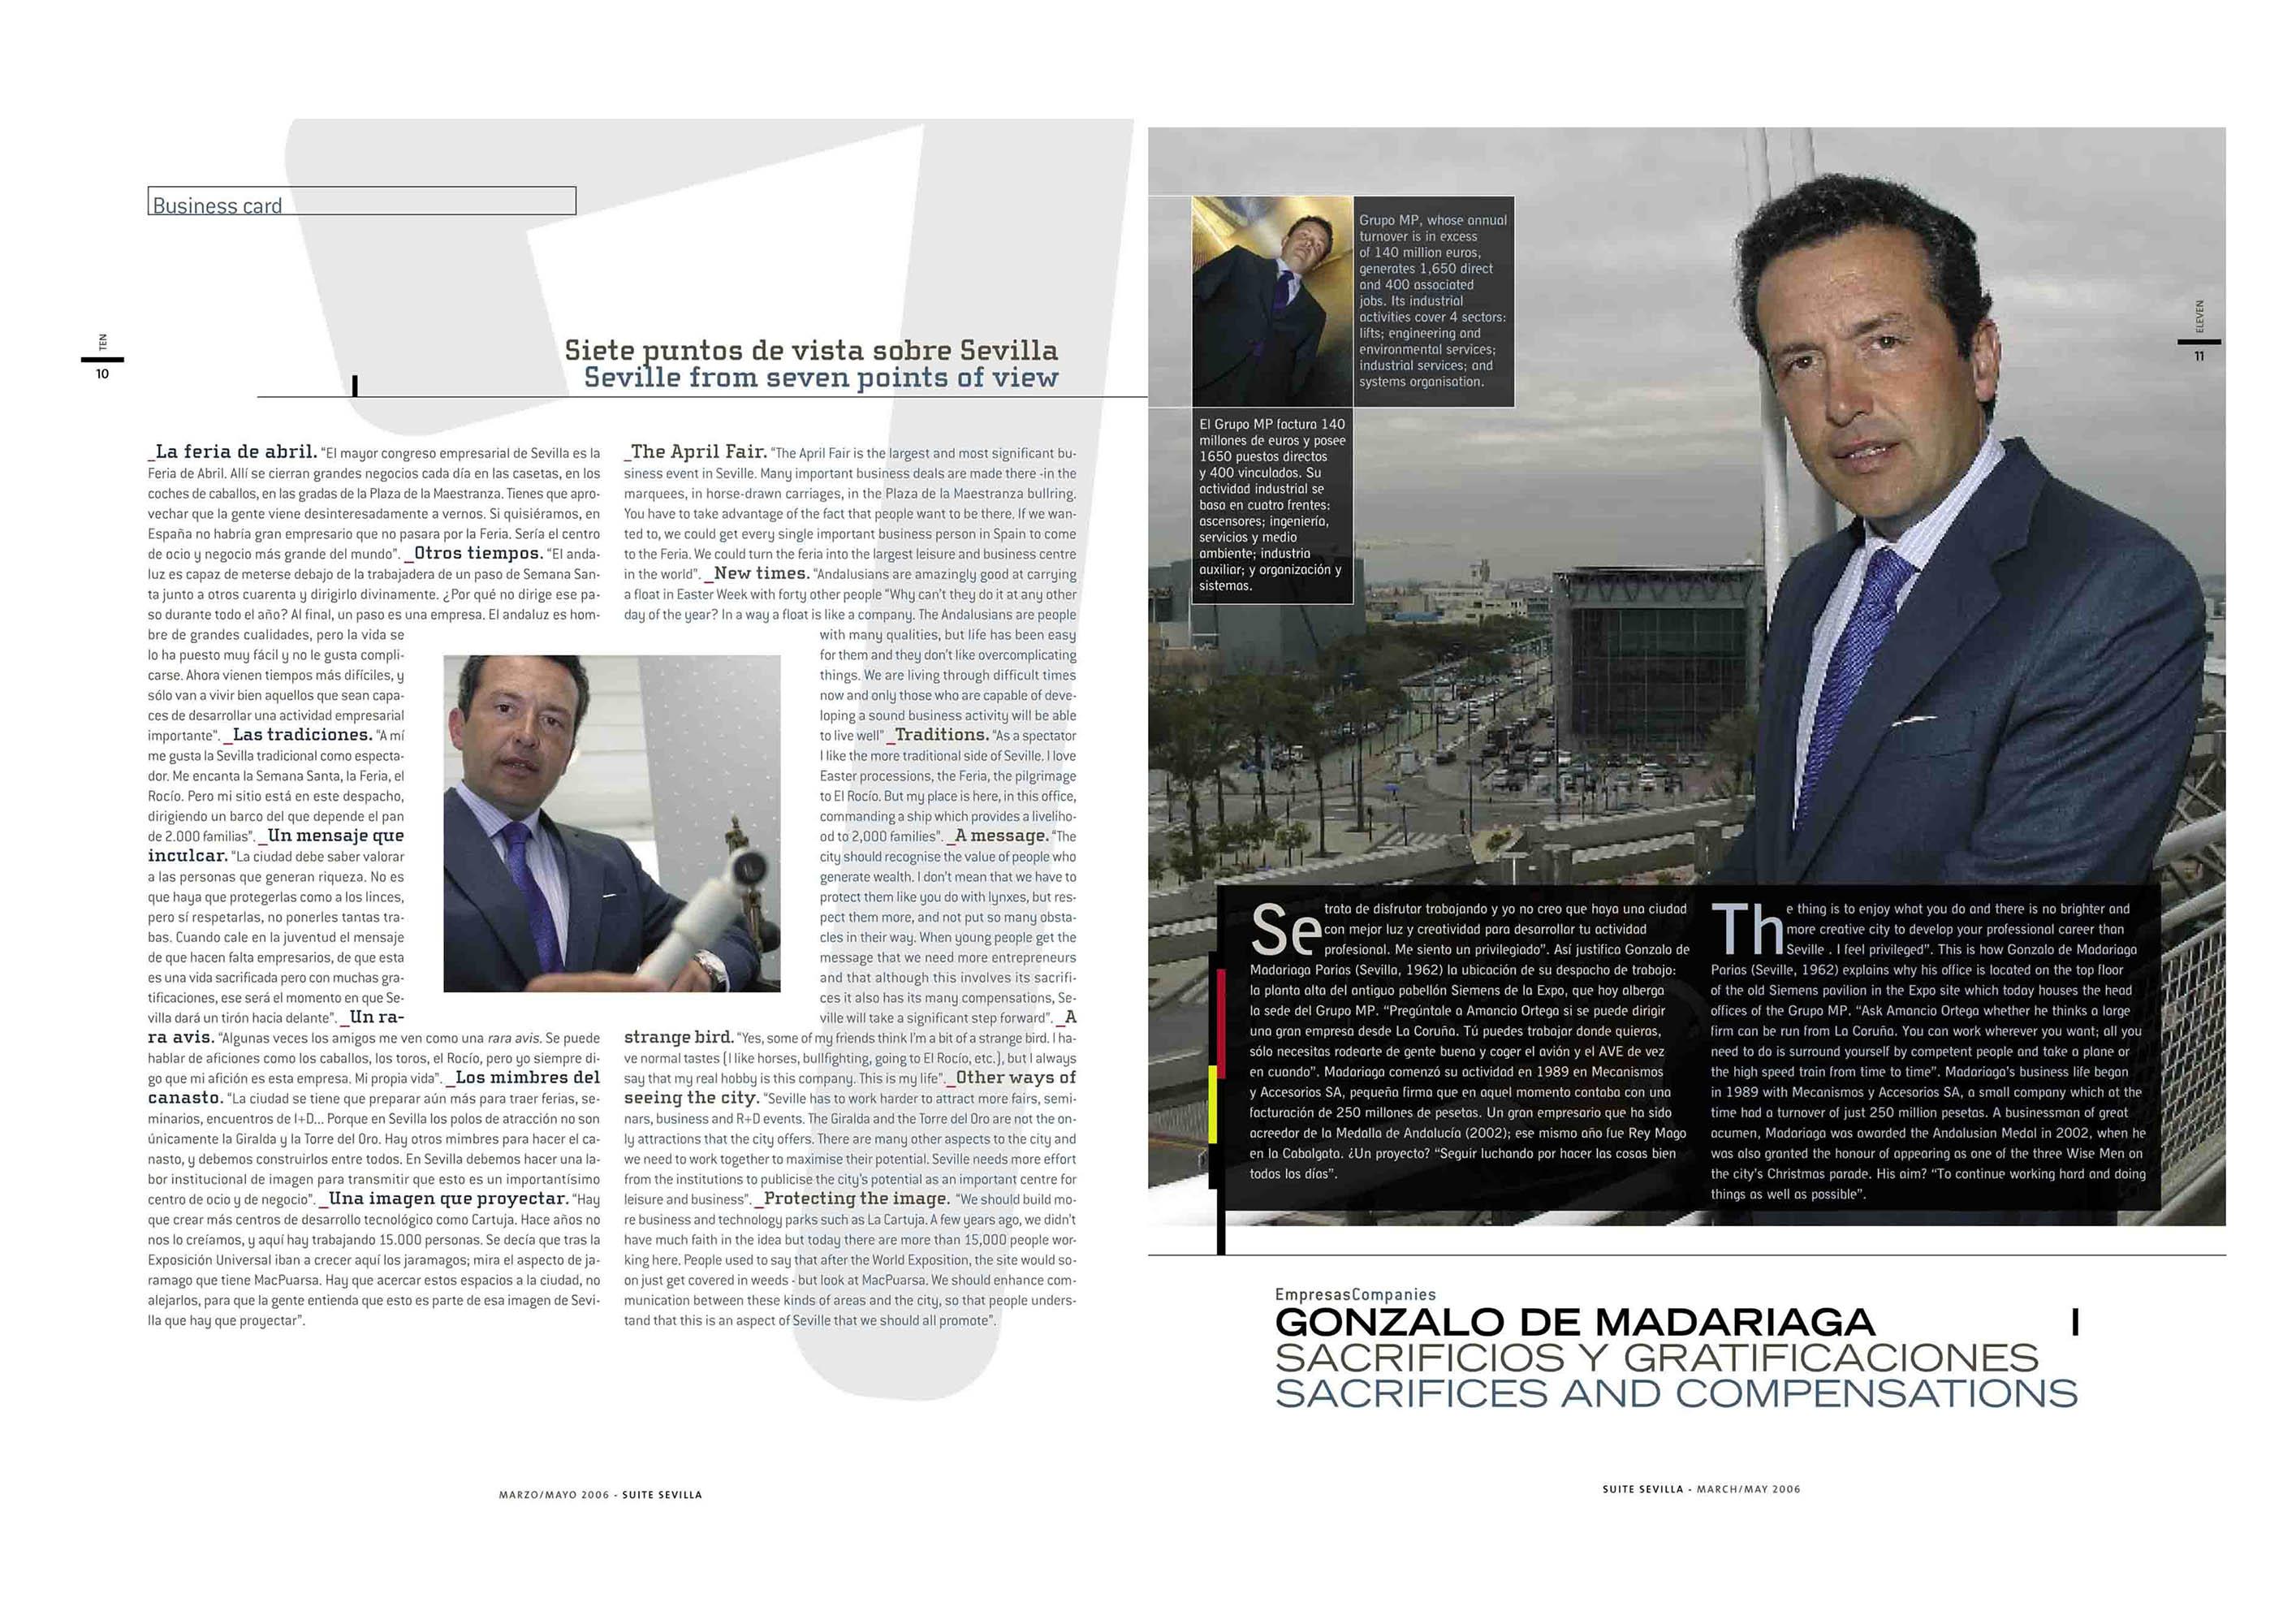 Gonzalo de Madariaga: siete puntos de vista sobre Sevilla | Suite Sevilla | mar 2006